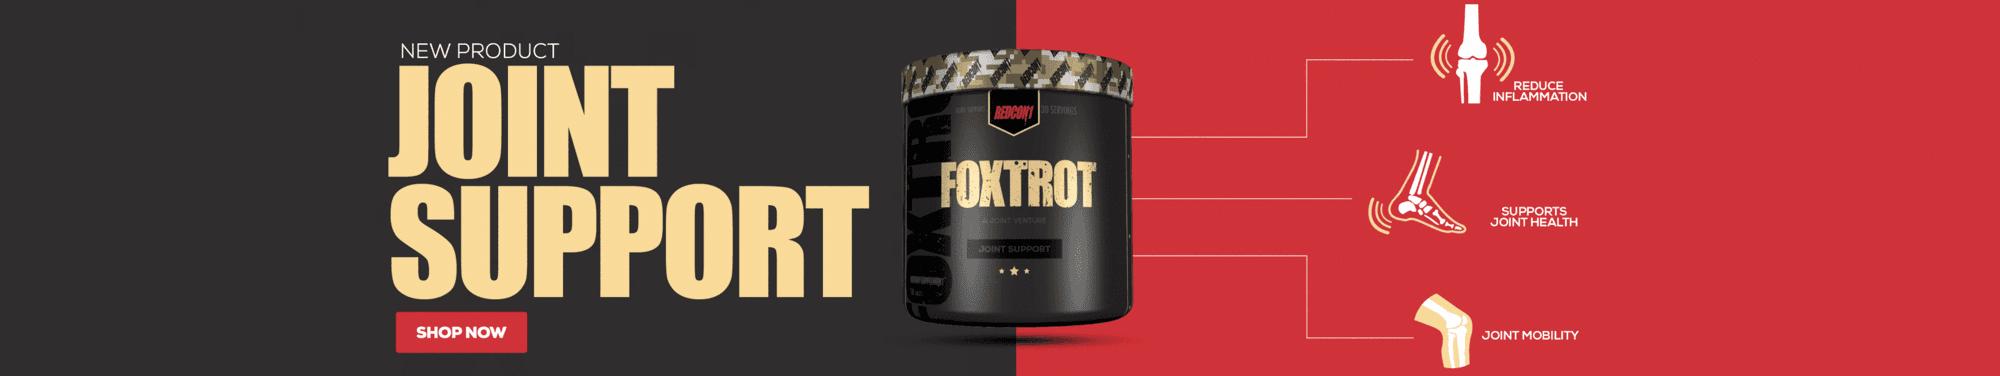 RC1 Foxtrot